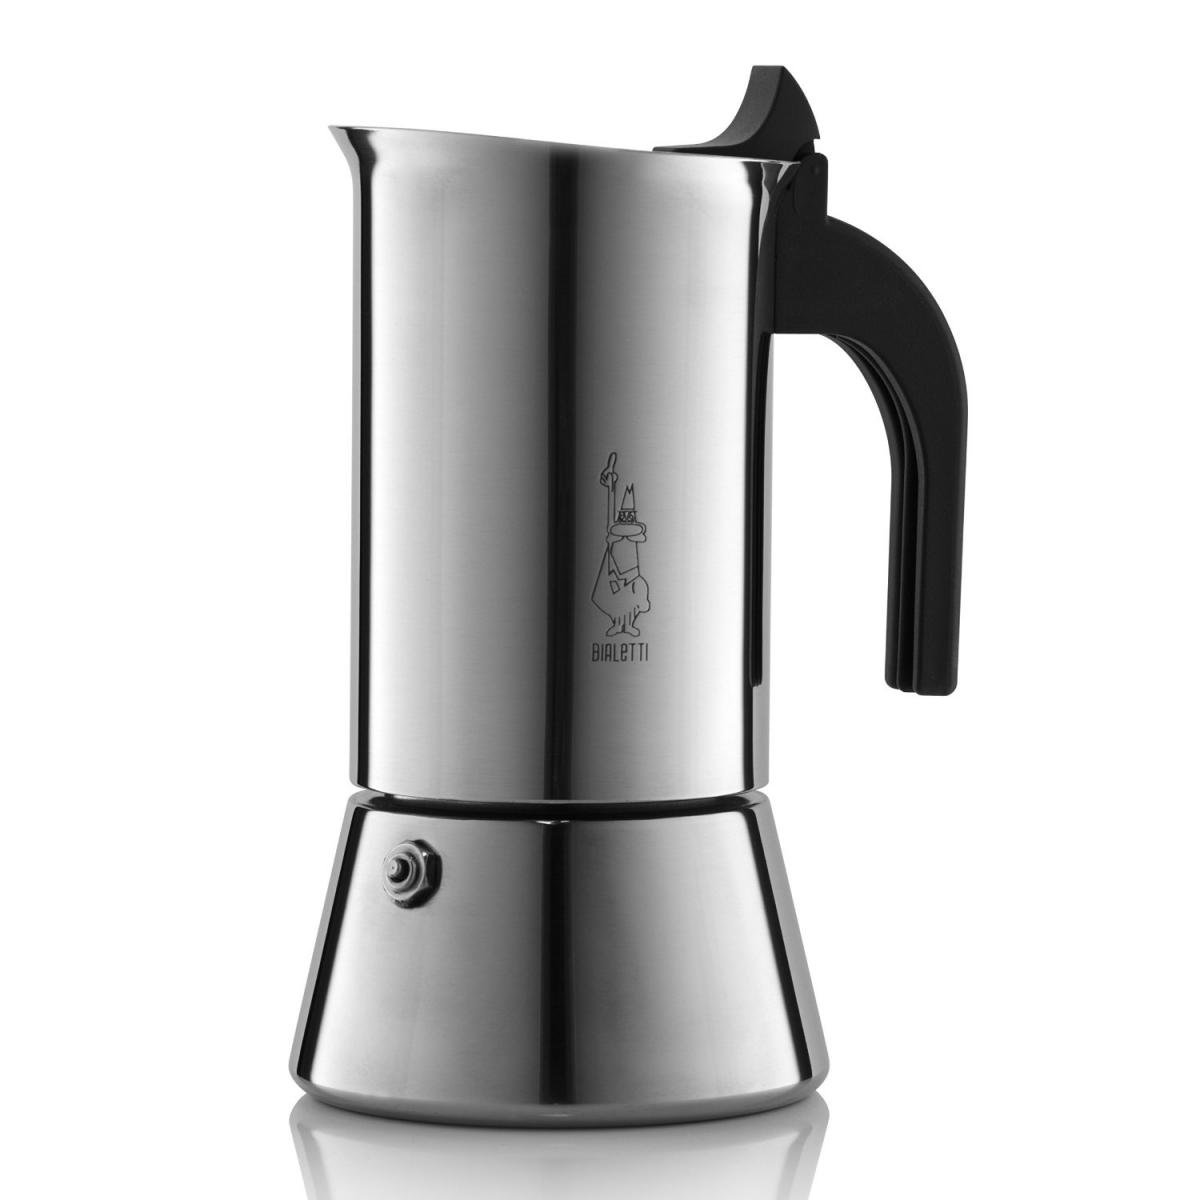 Bialetti kávovar Venus, 6 šálků